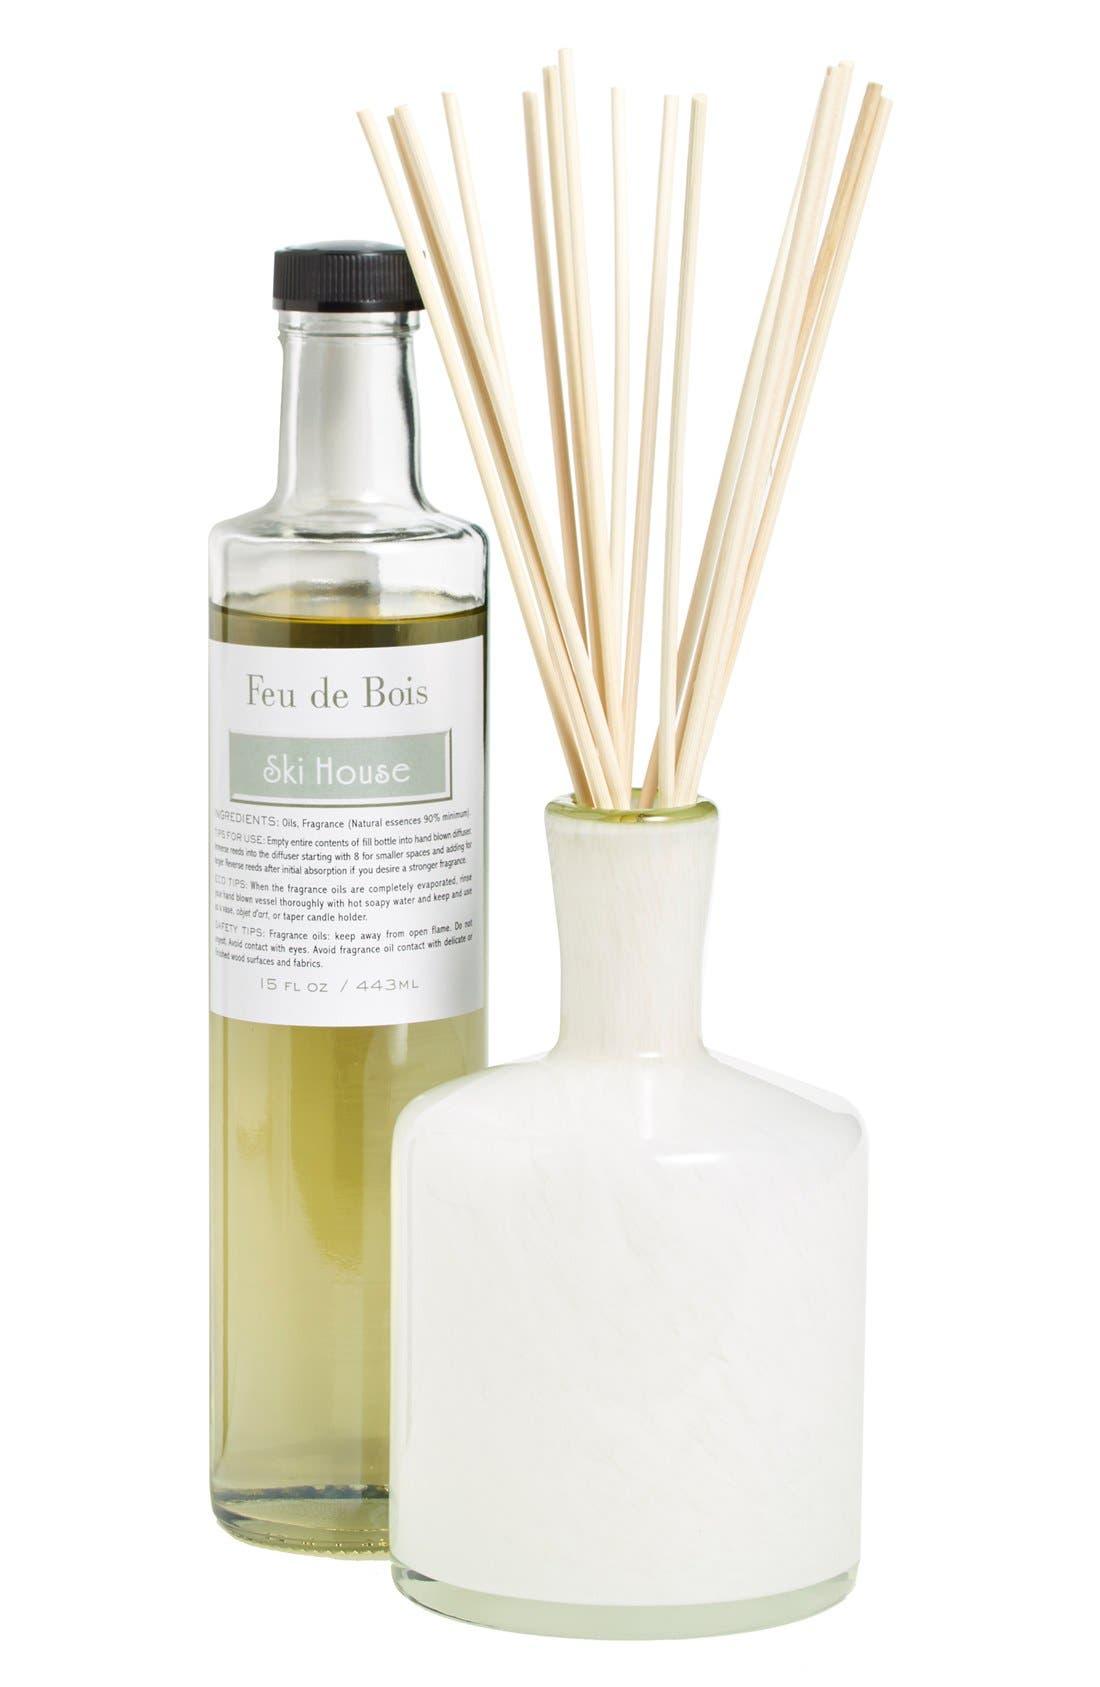 LAFCO 'Feu de Bois - Ski House' Fragrance